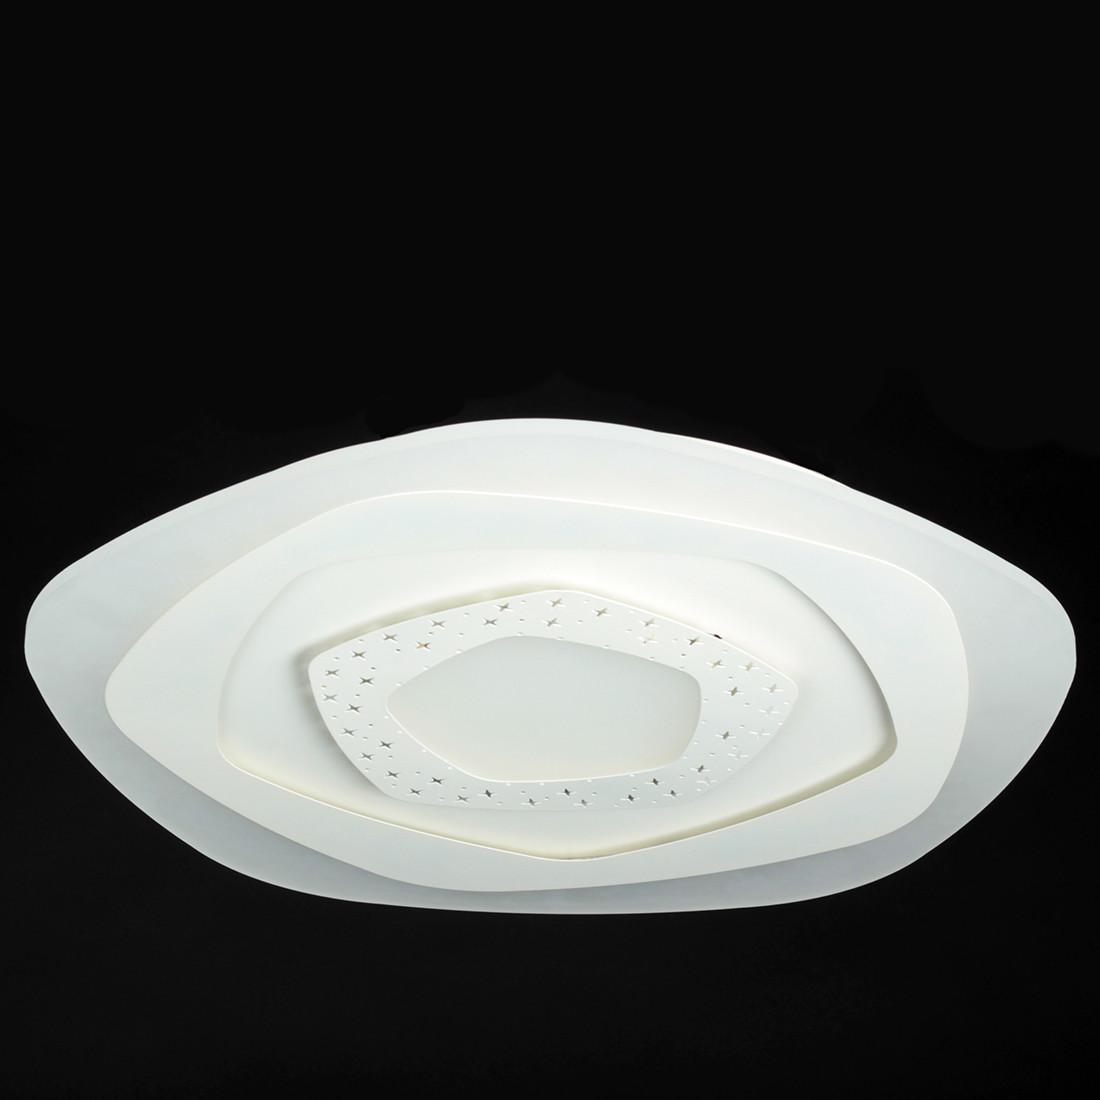 Люстра светодиодная SP-8505/500 WHITE